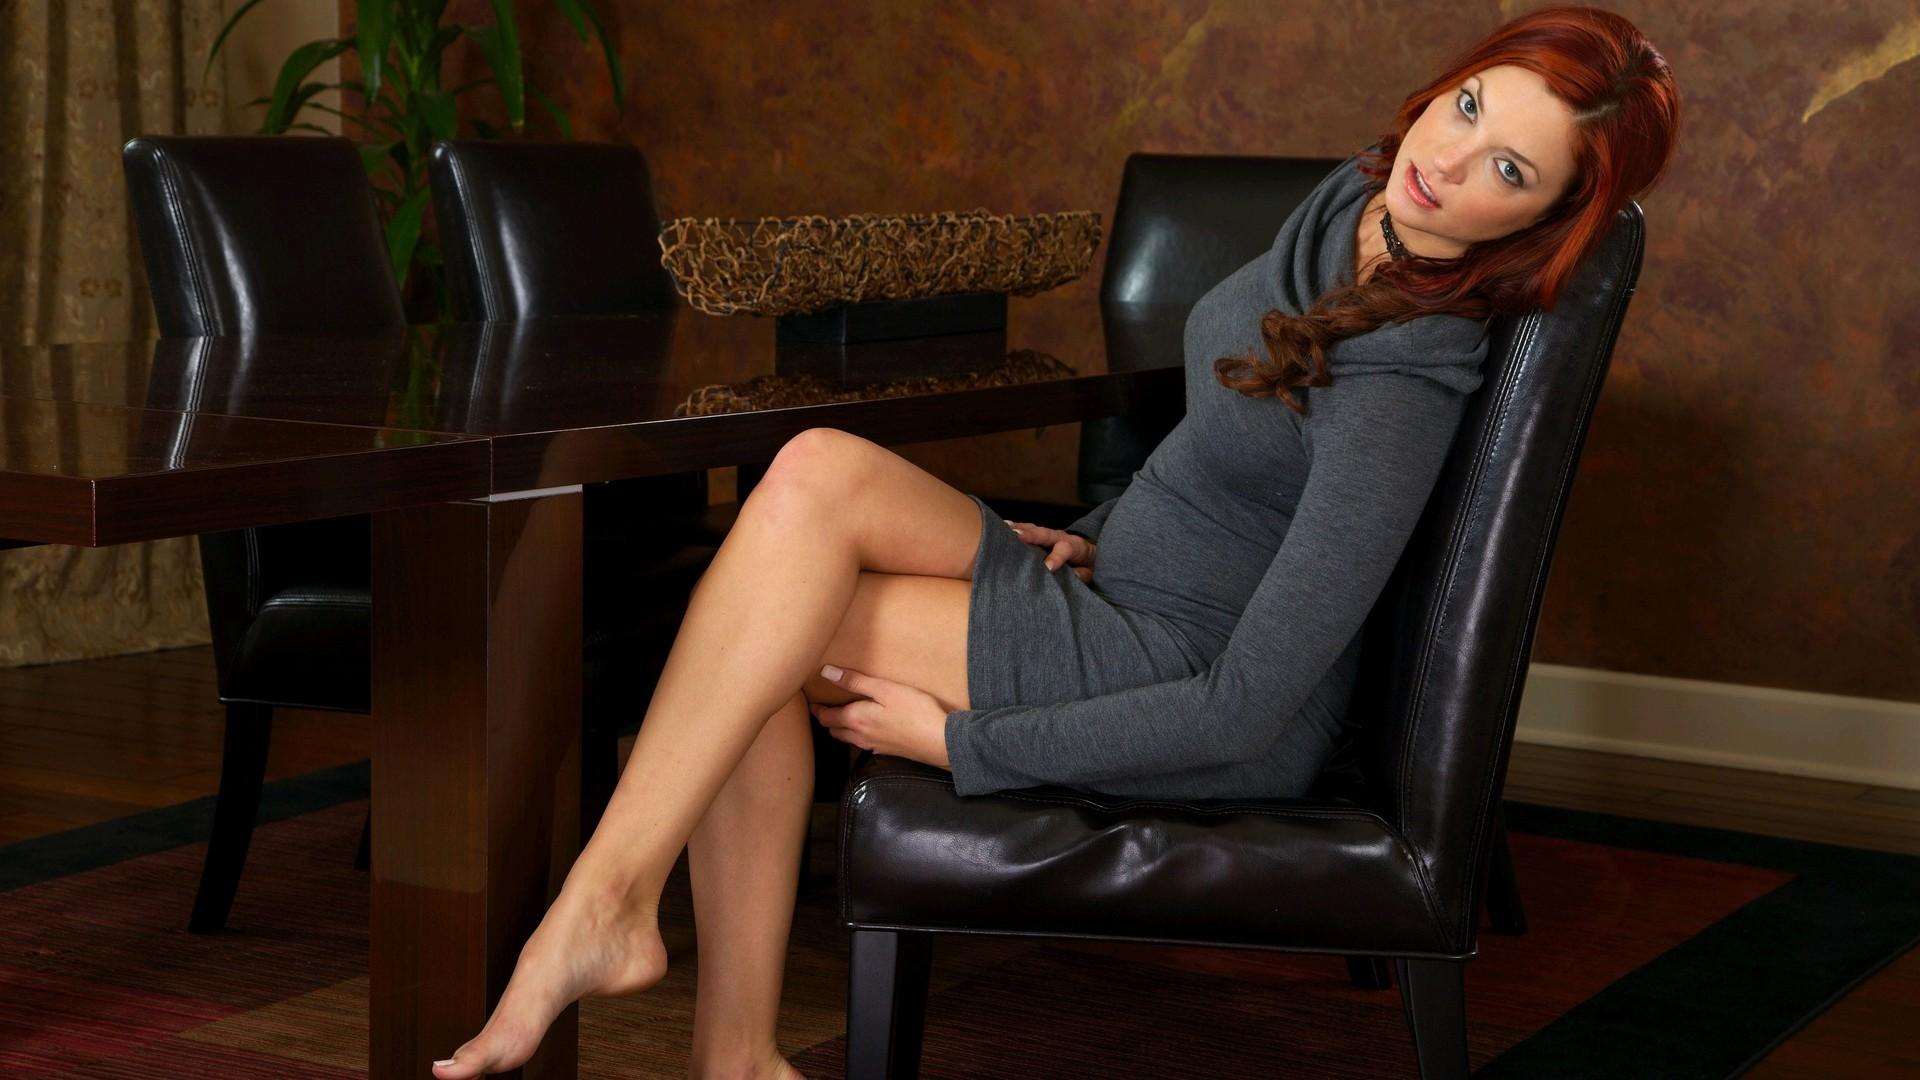 Samantha mcconnel porn star